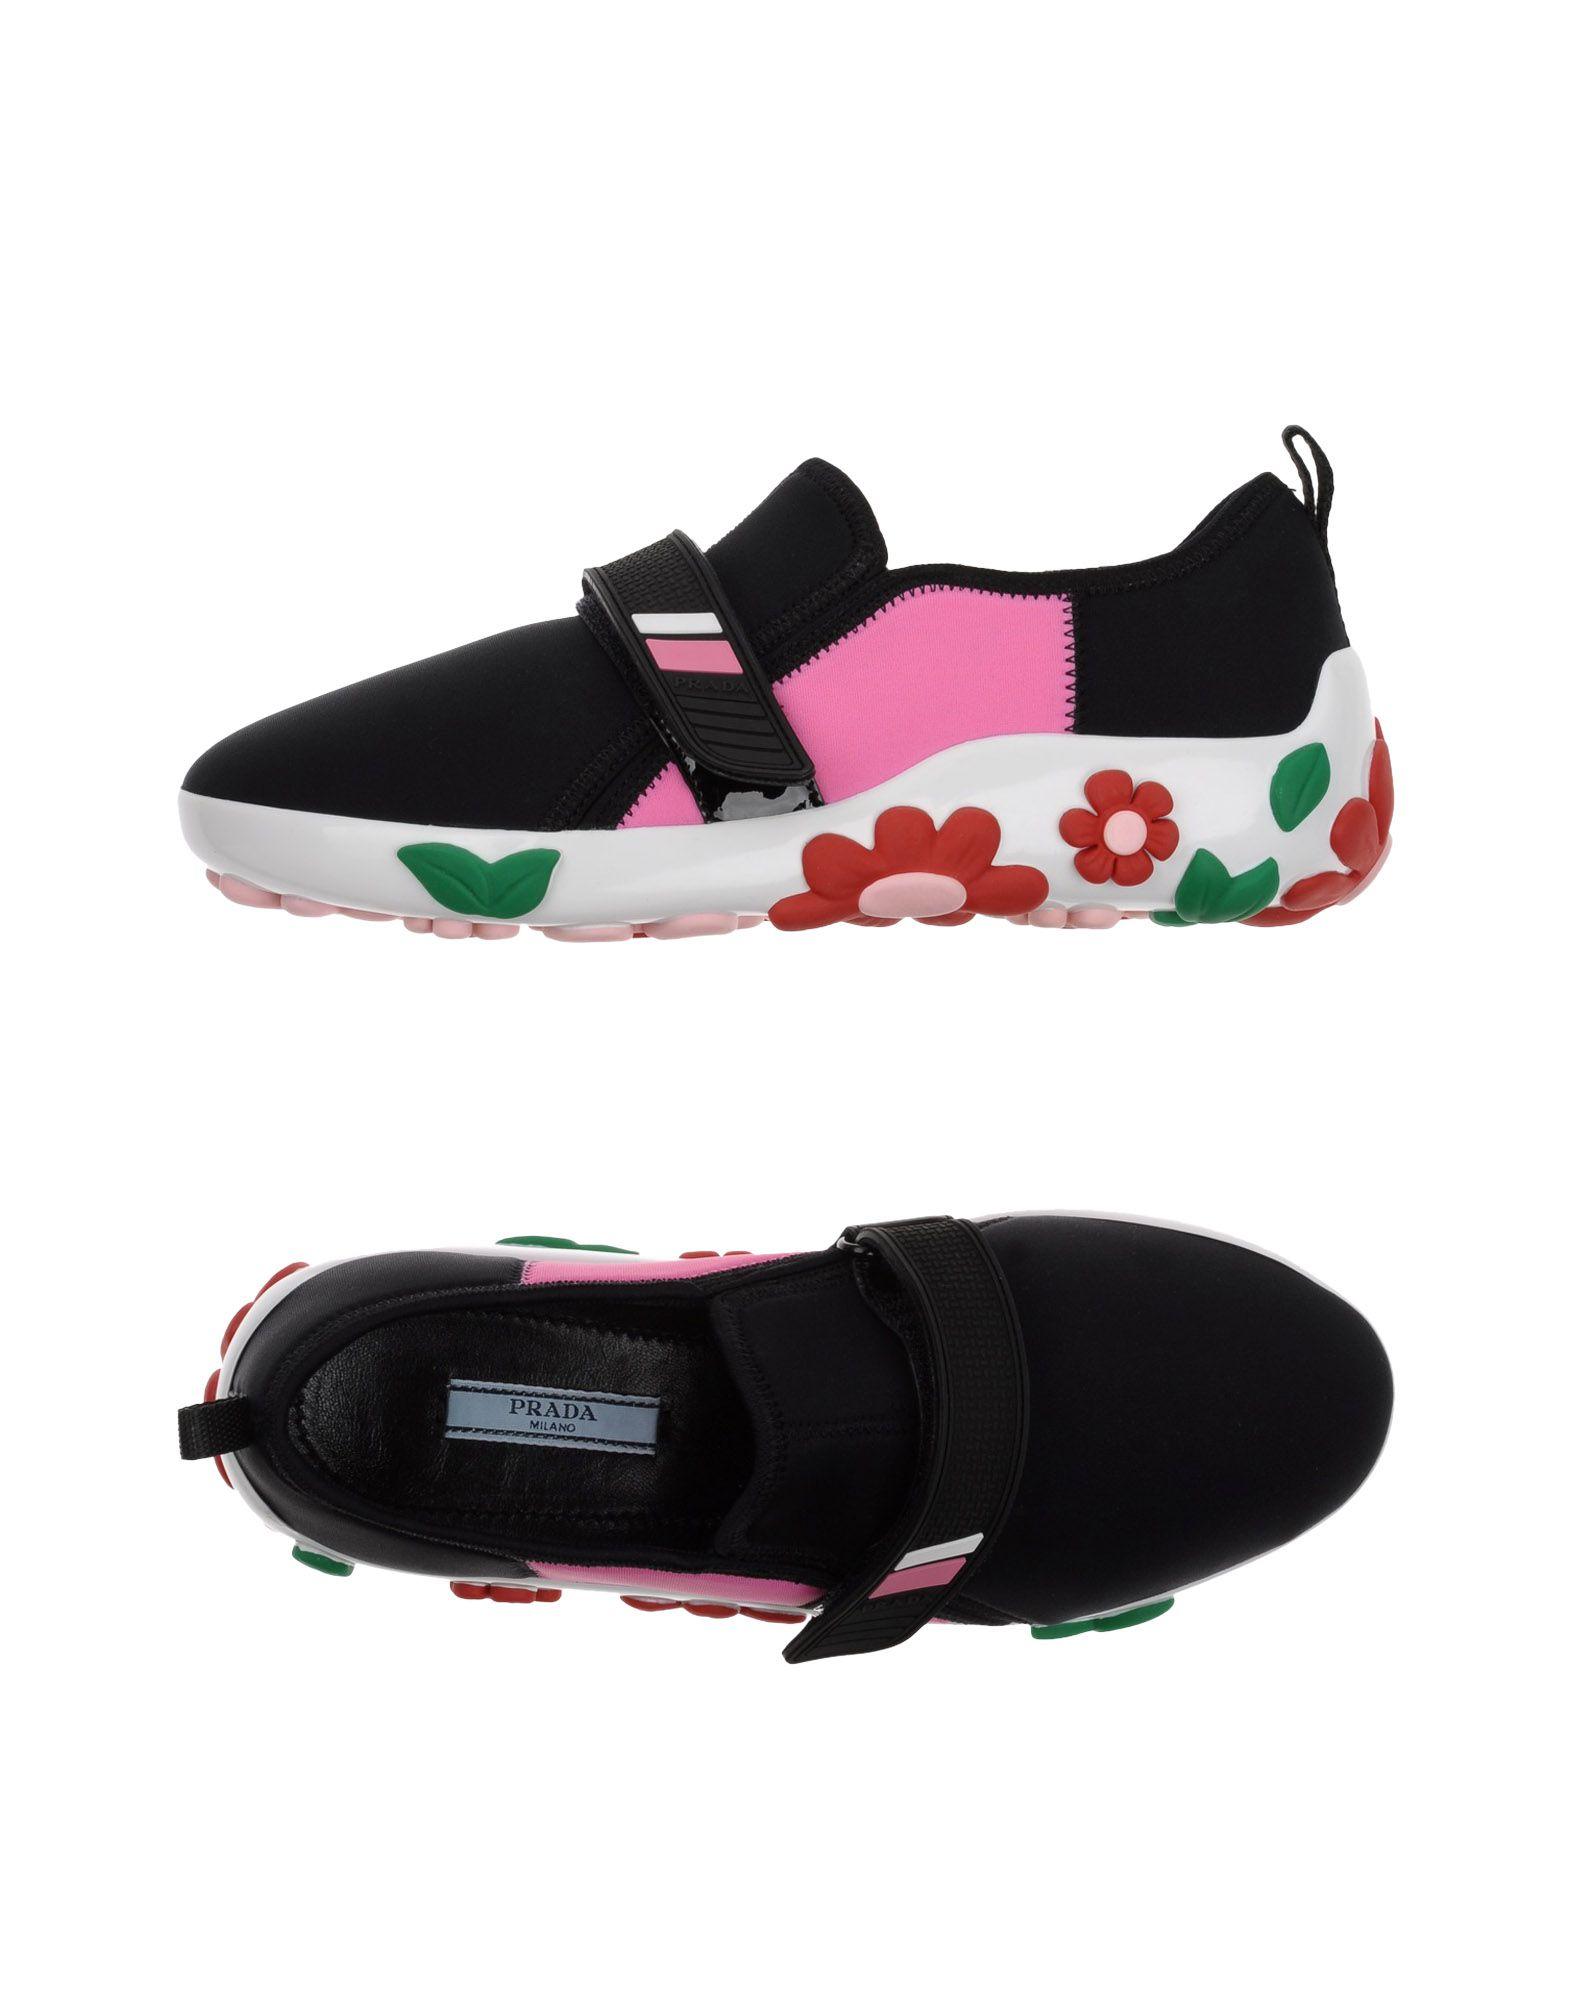 Prada gut Sneakers Damen  11363293HGGünstige gut Prada aussehende Schuhe 17fb2c